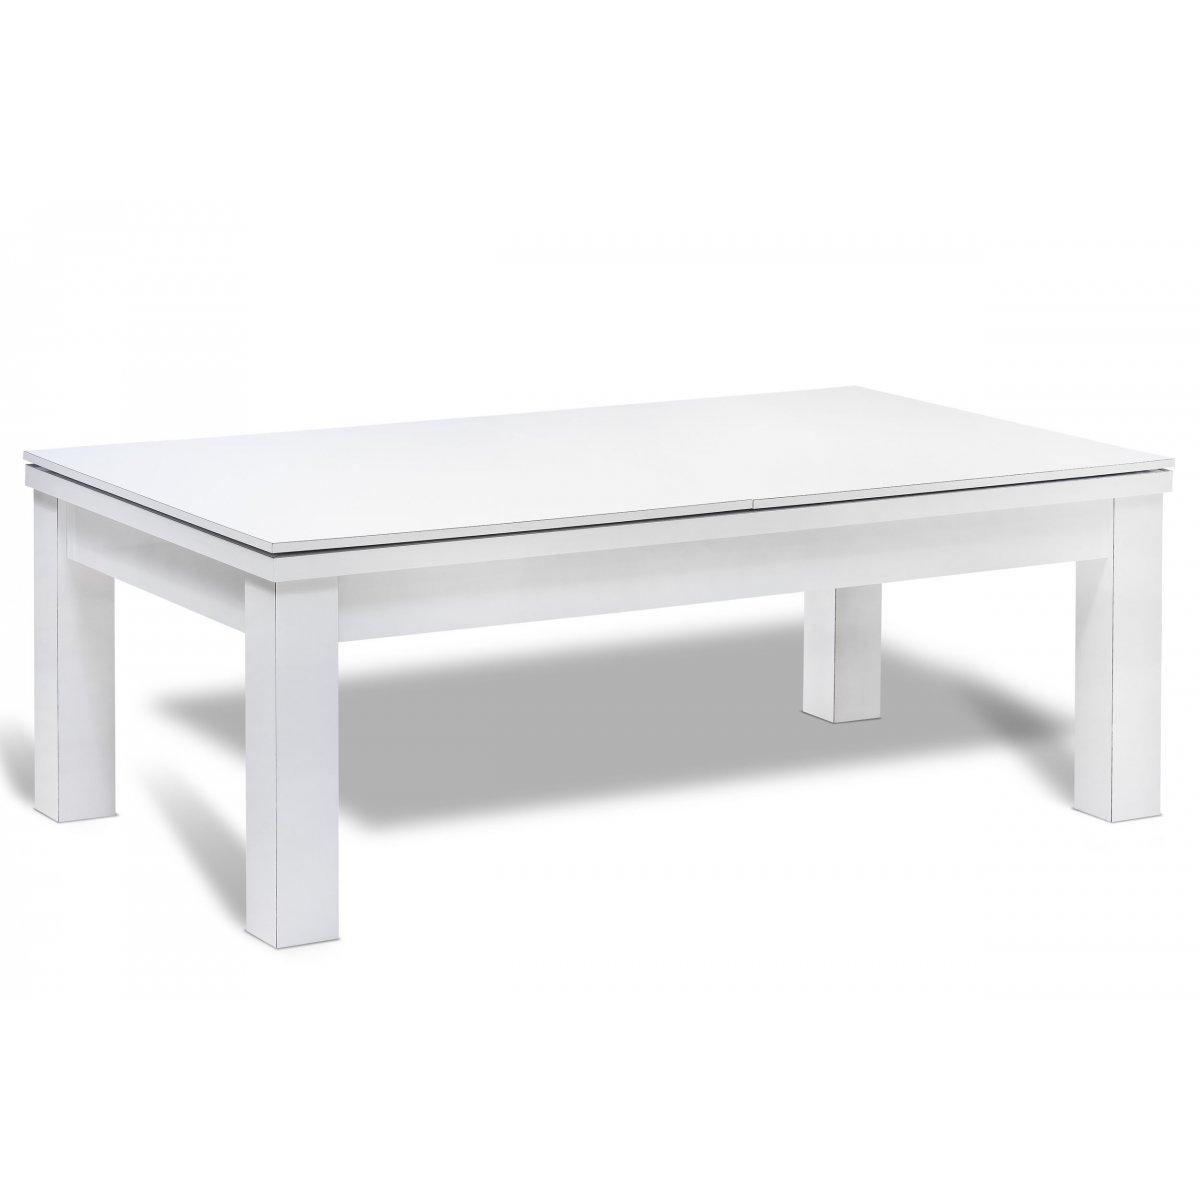 table billard transformable et dessus de table en bois blanc. Black Bedroom Furniture Sets. Home Design Ideas